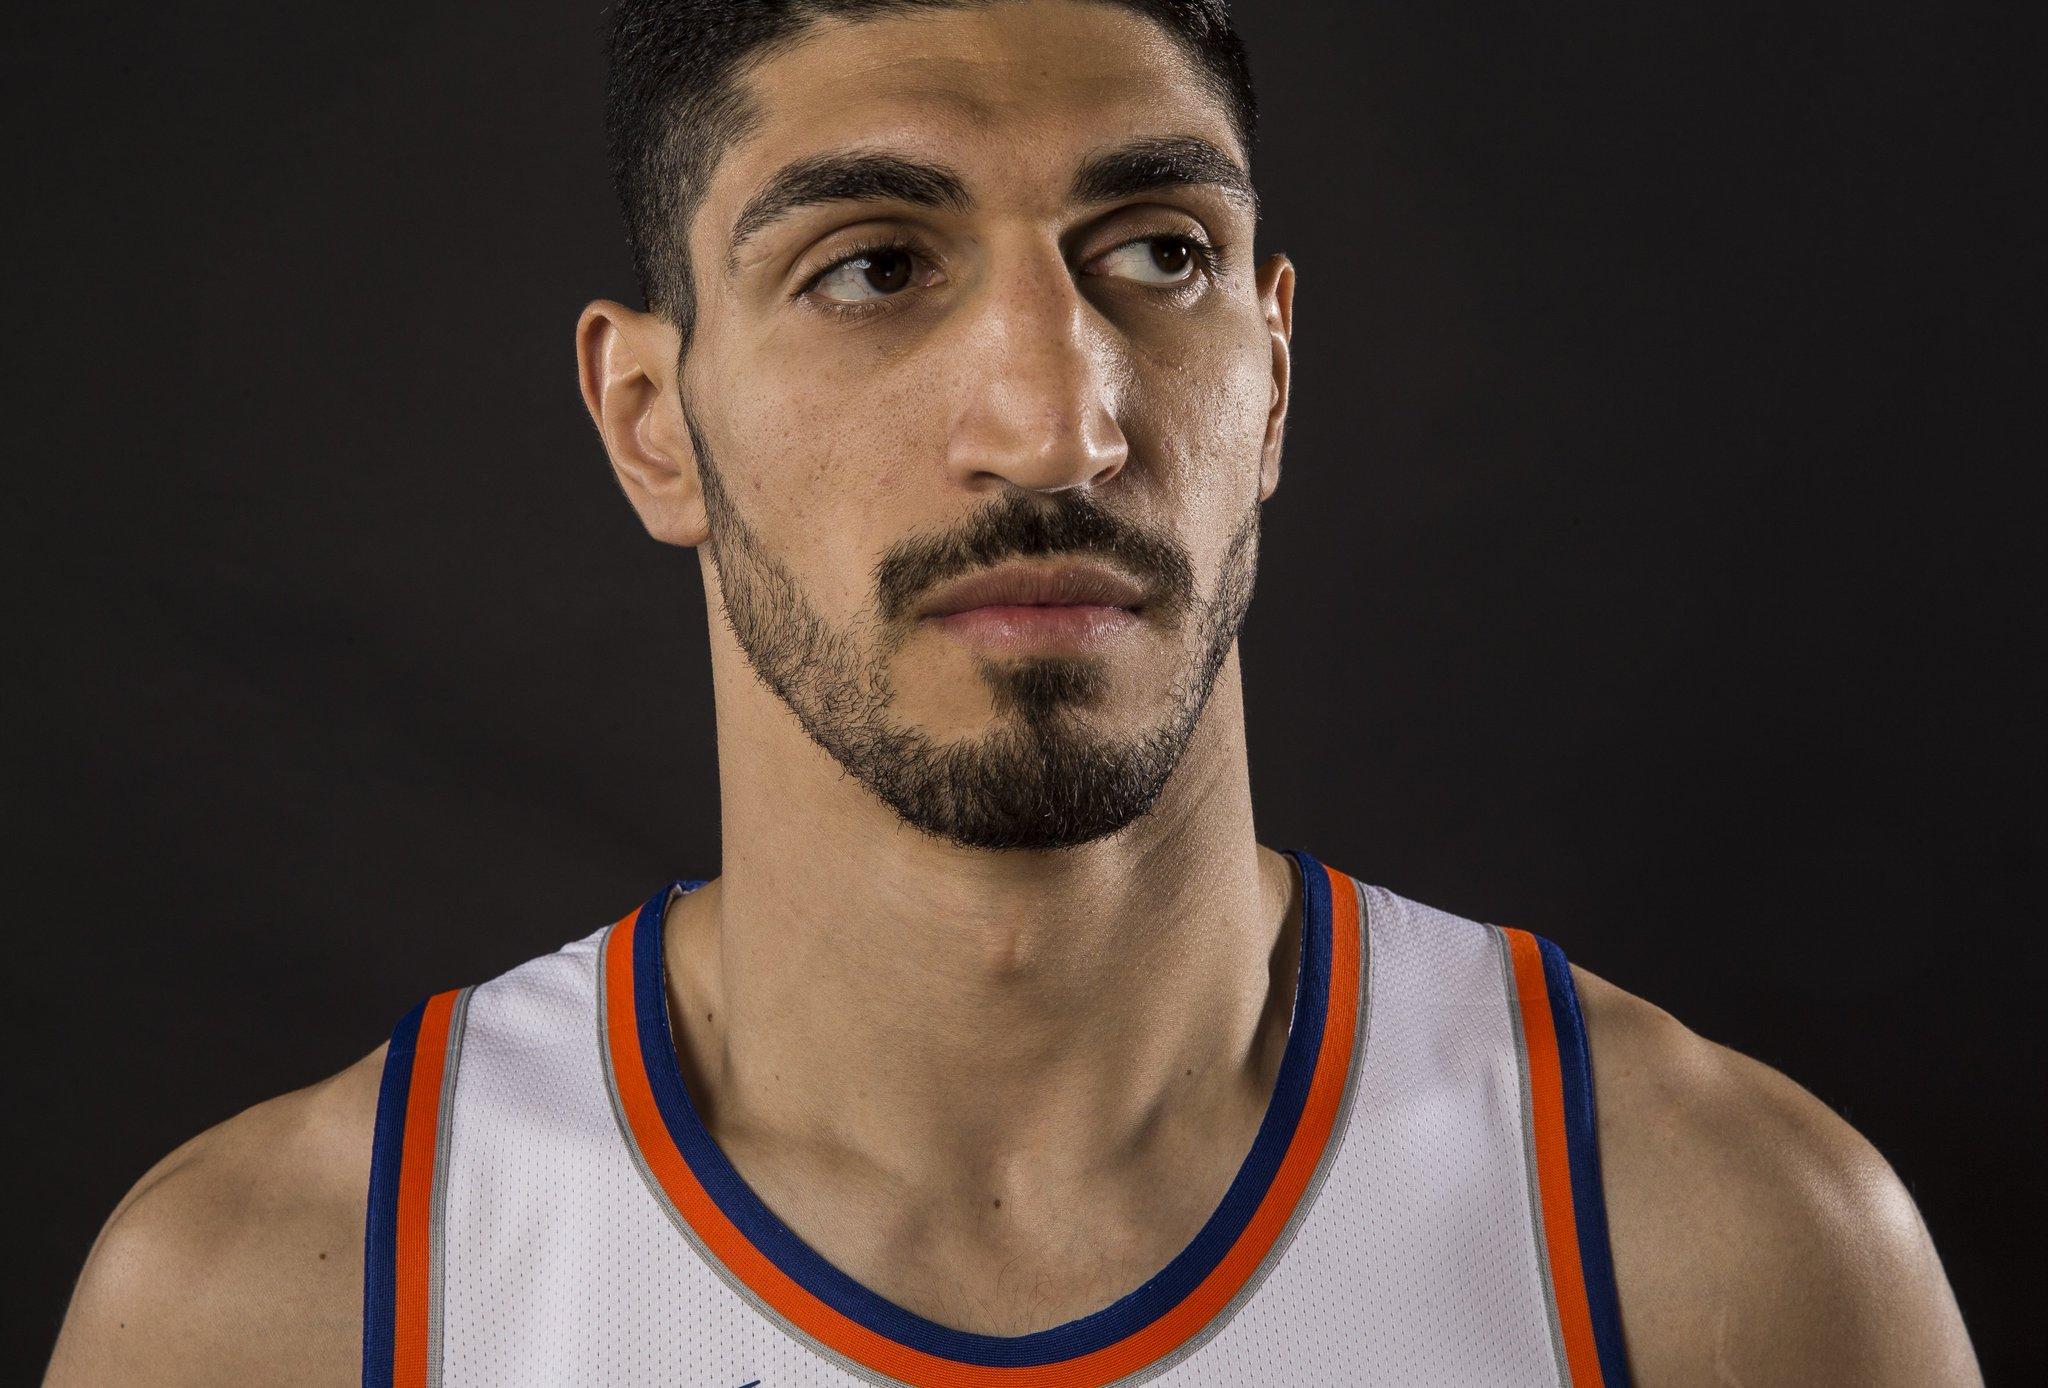 Join us in wishing @Enes_Kanter of the @nyknicks a HAPPY 26th BIRTHDAY!   #NBABDAY #Knicks https://t.co/iAVaVOb3g5